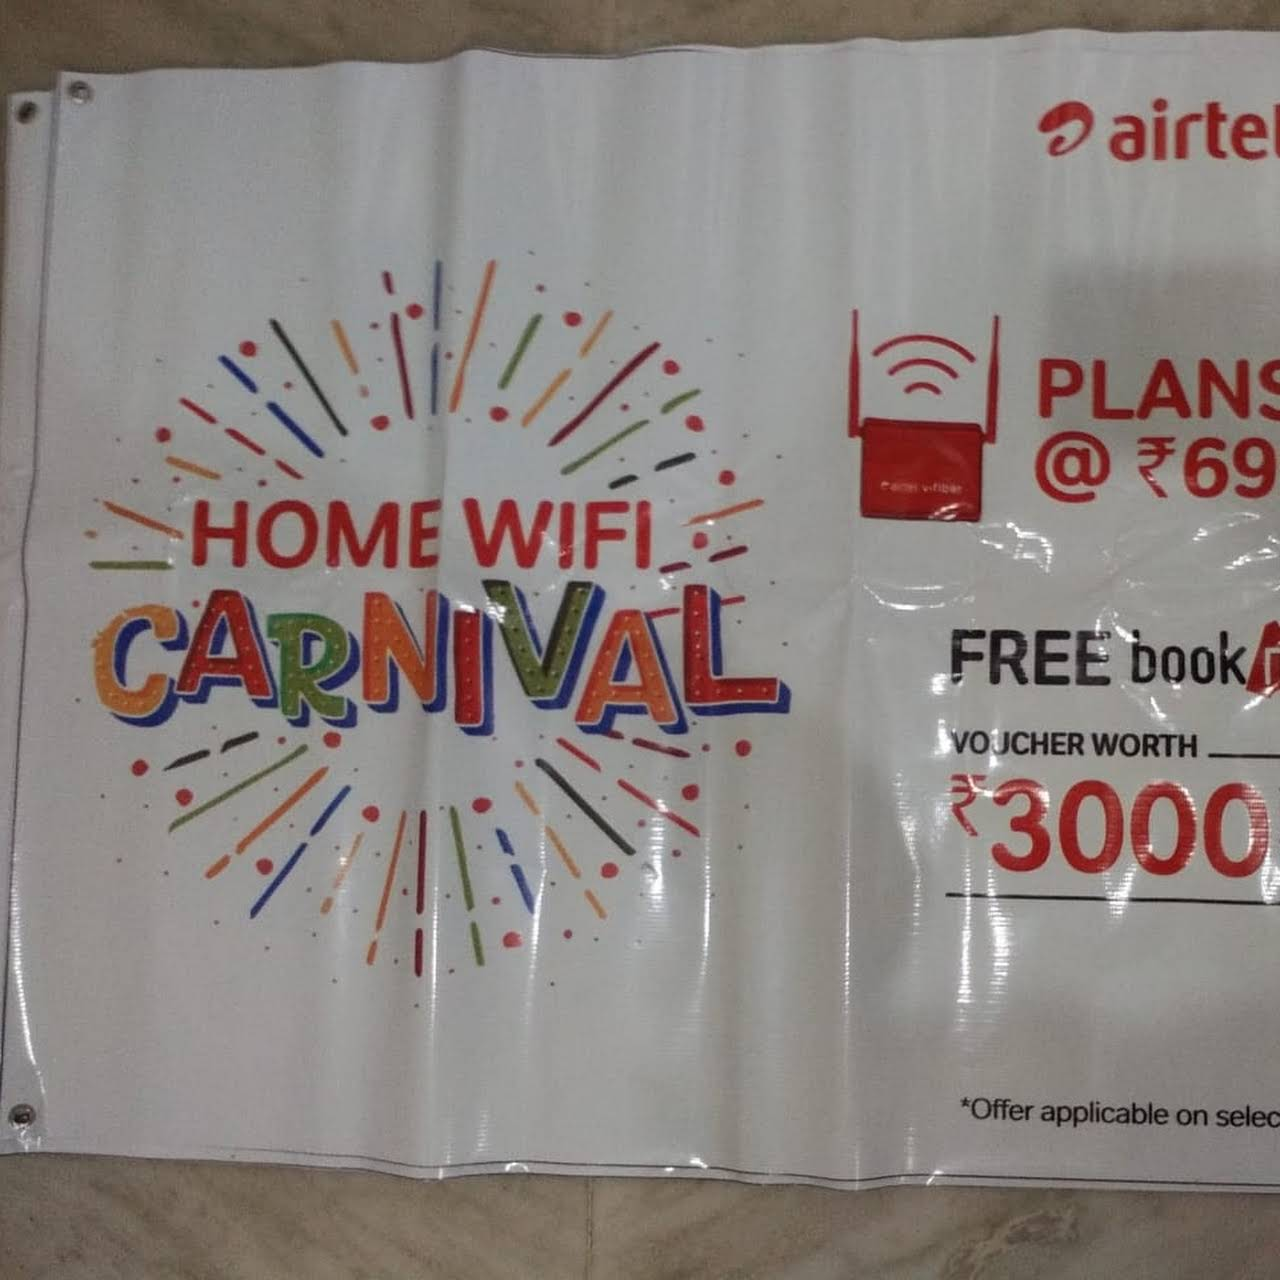 AIRTEL BROADBAND IN KANPUR - Internet Service Provider in Kanpur